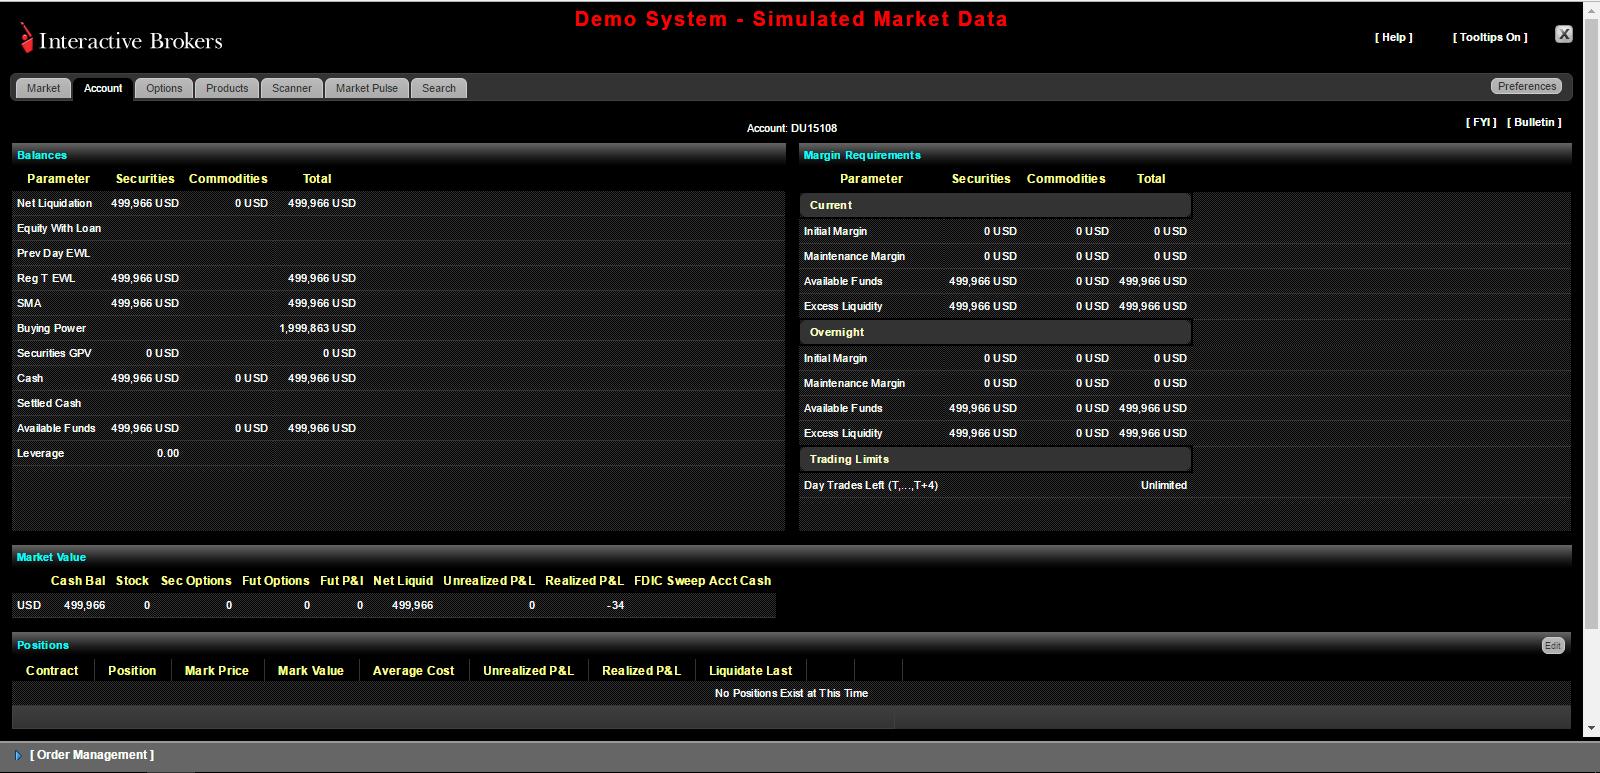 ESMA-CFD-intervention-new-regulation-blogpost-interactive-brokers-web-trading-platform